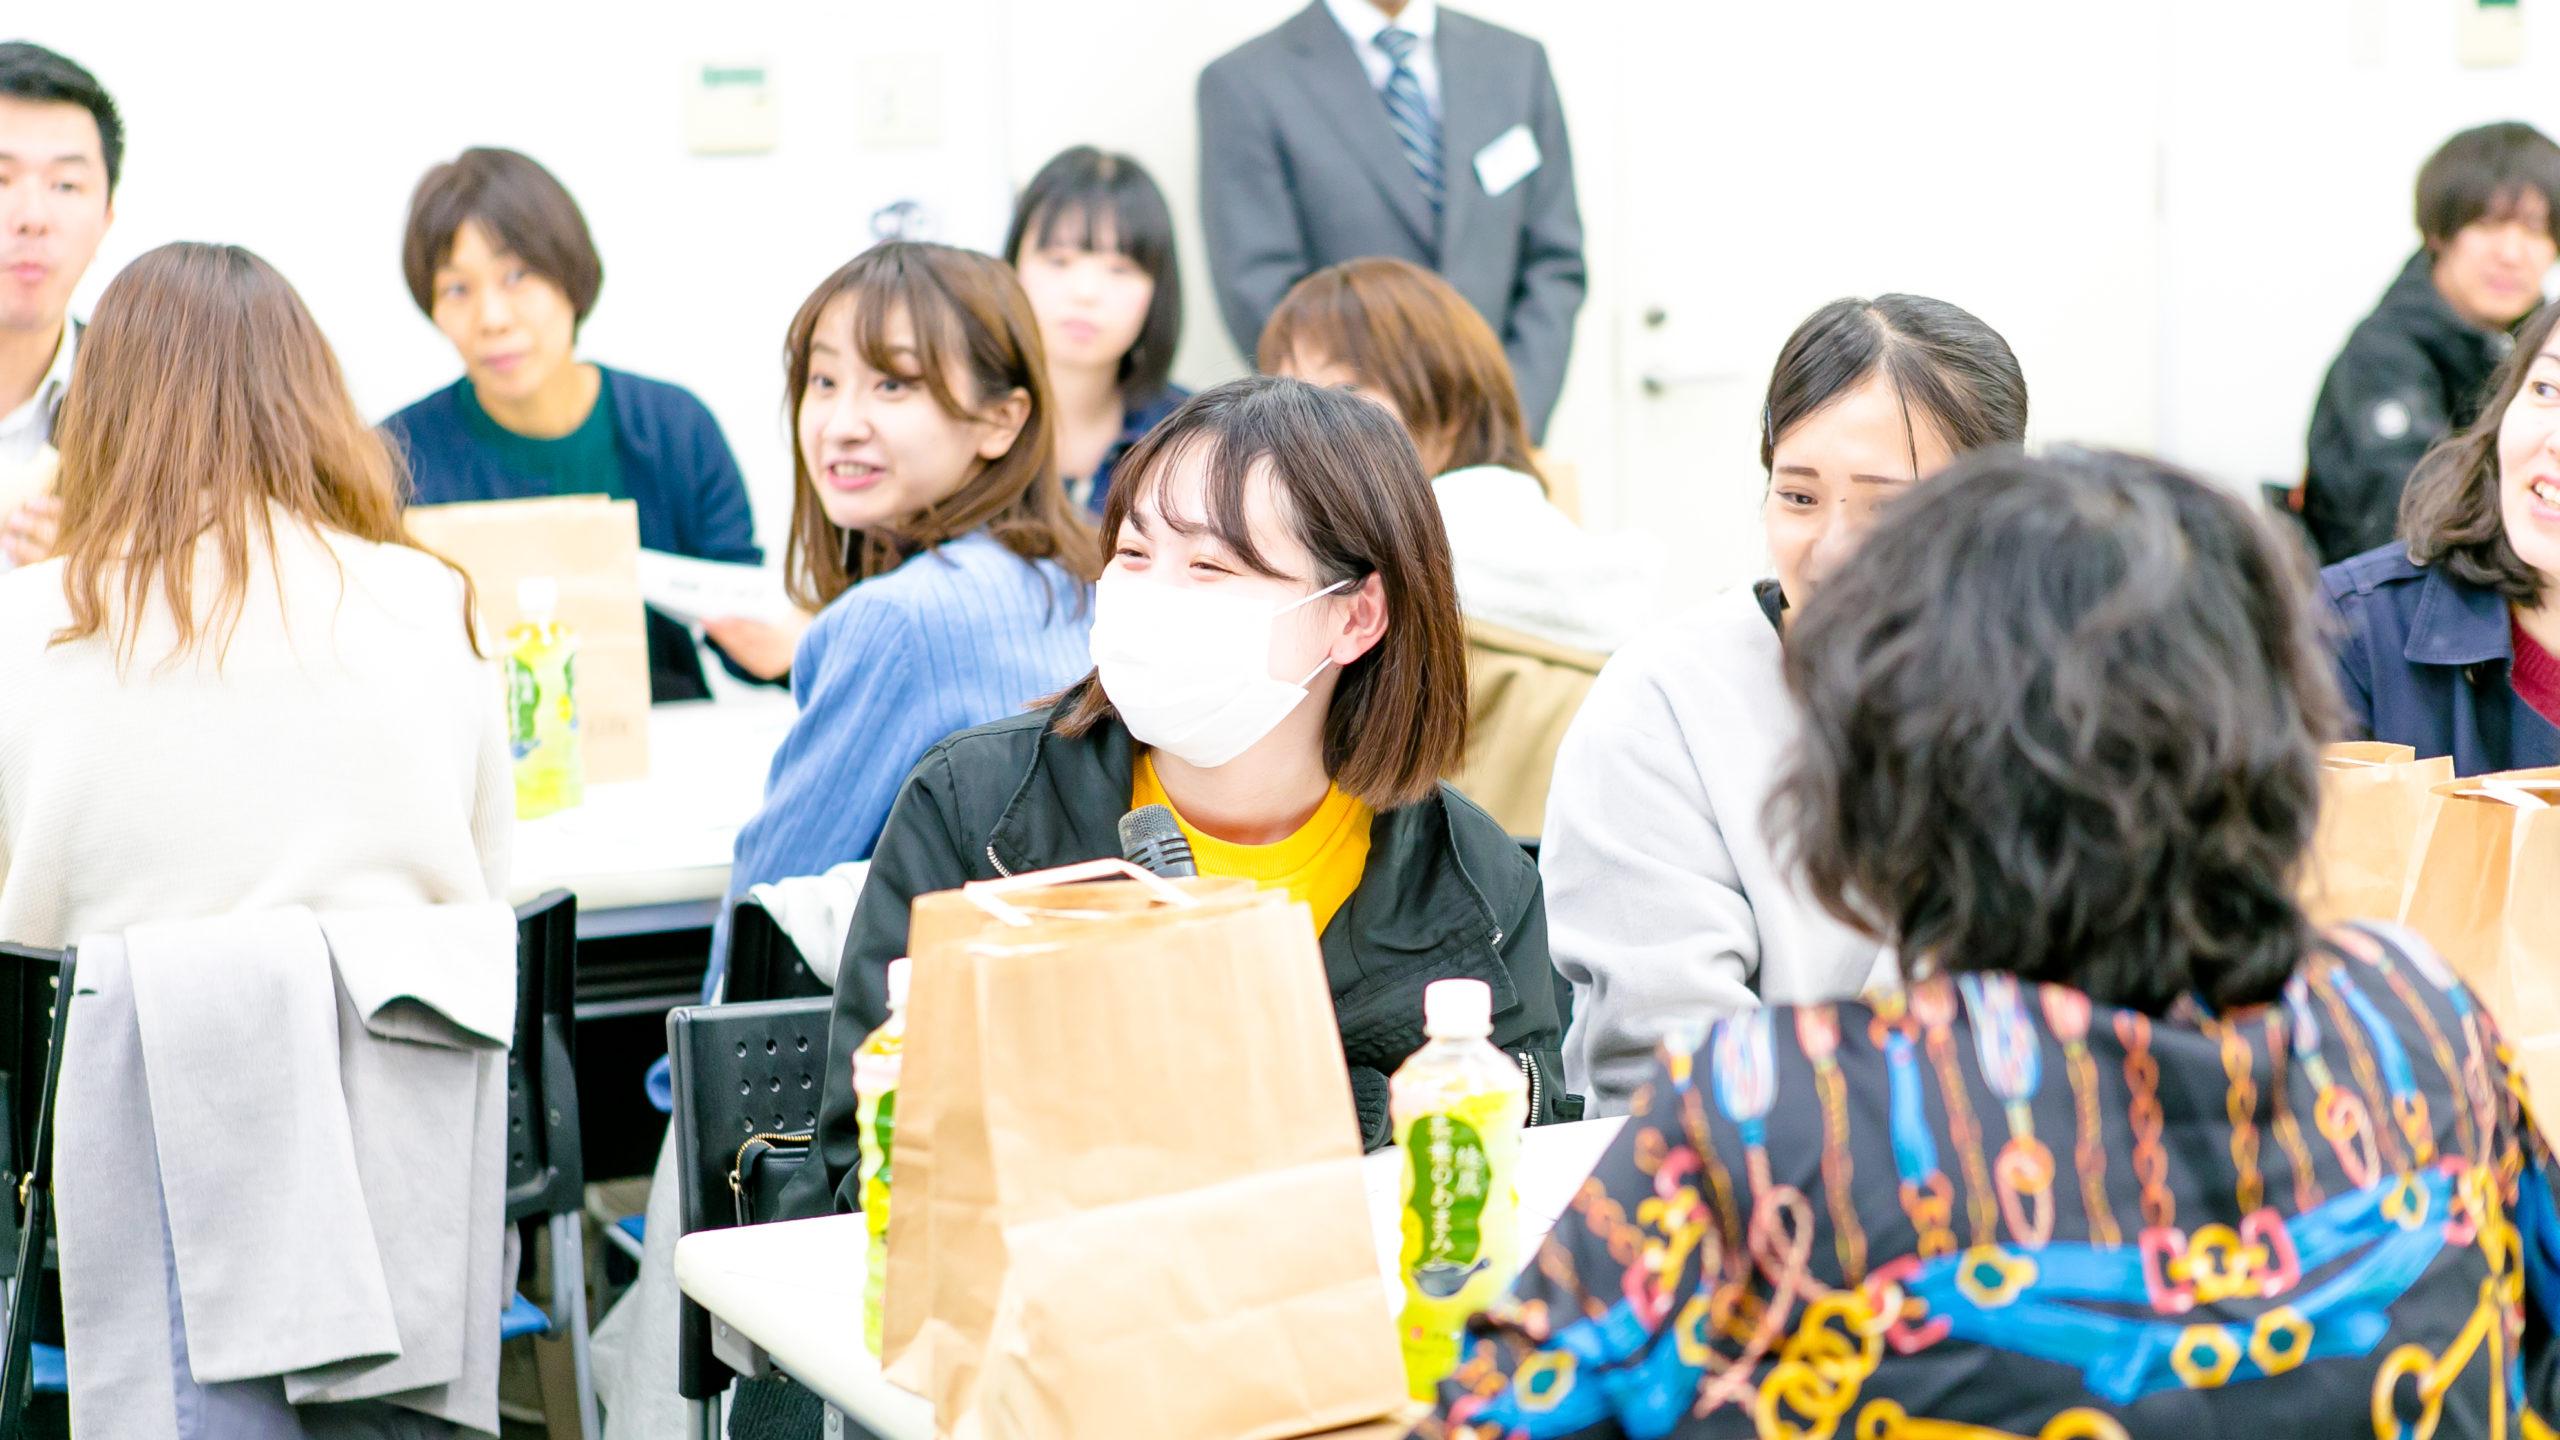 kagosimayakkyokuyakuzaisisiraogawakensyu-067